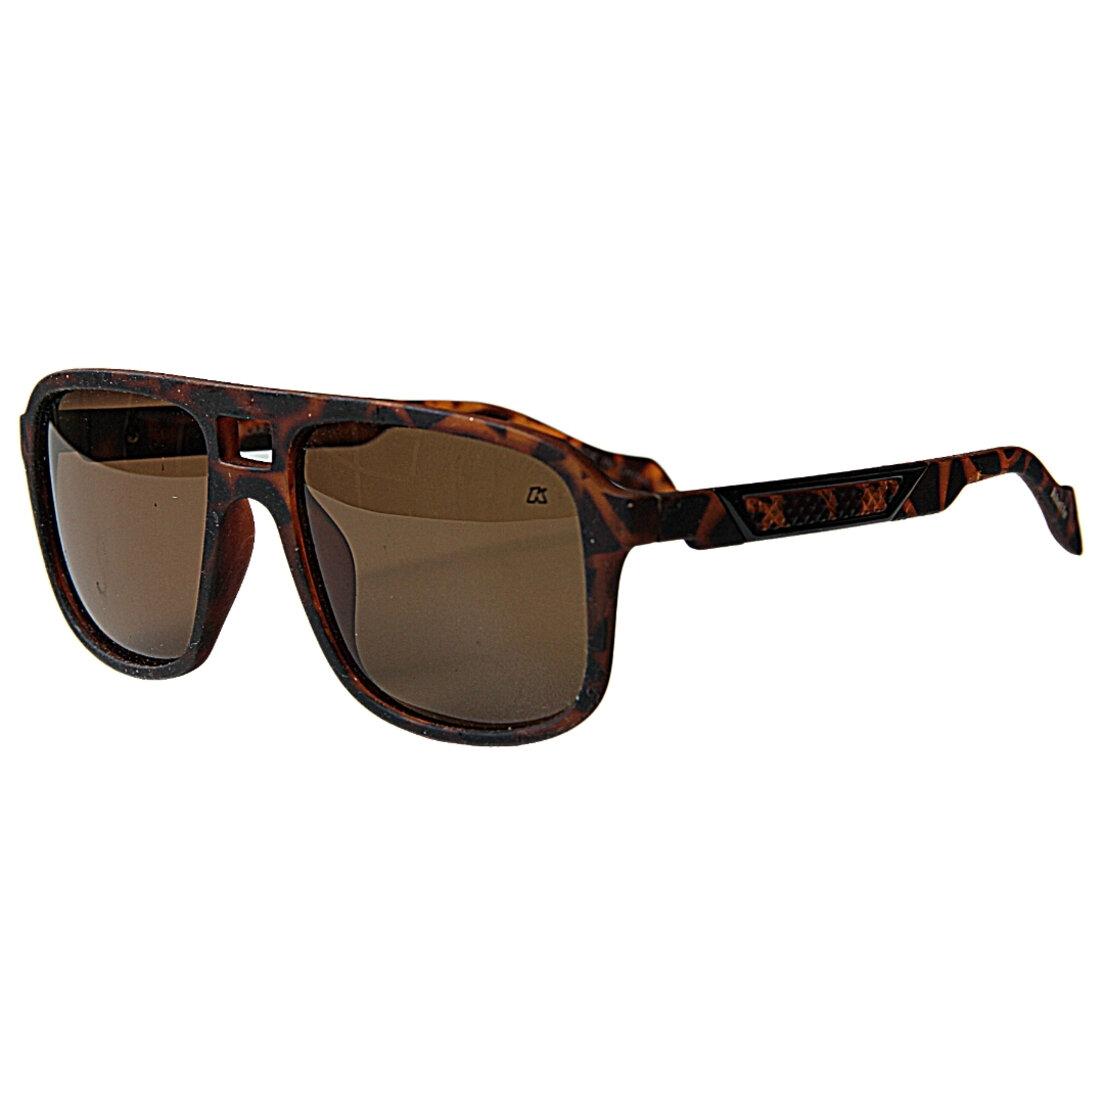 OUTLET - Óculos de Sol Khatto Carrera New Polarizado